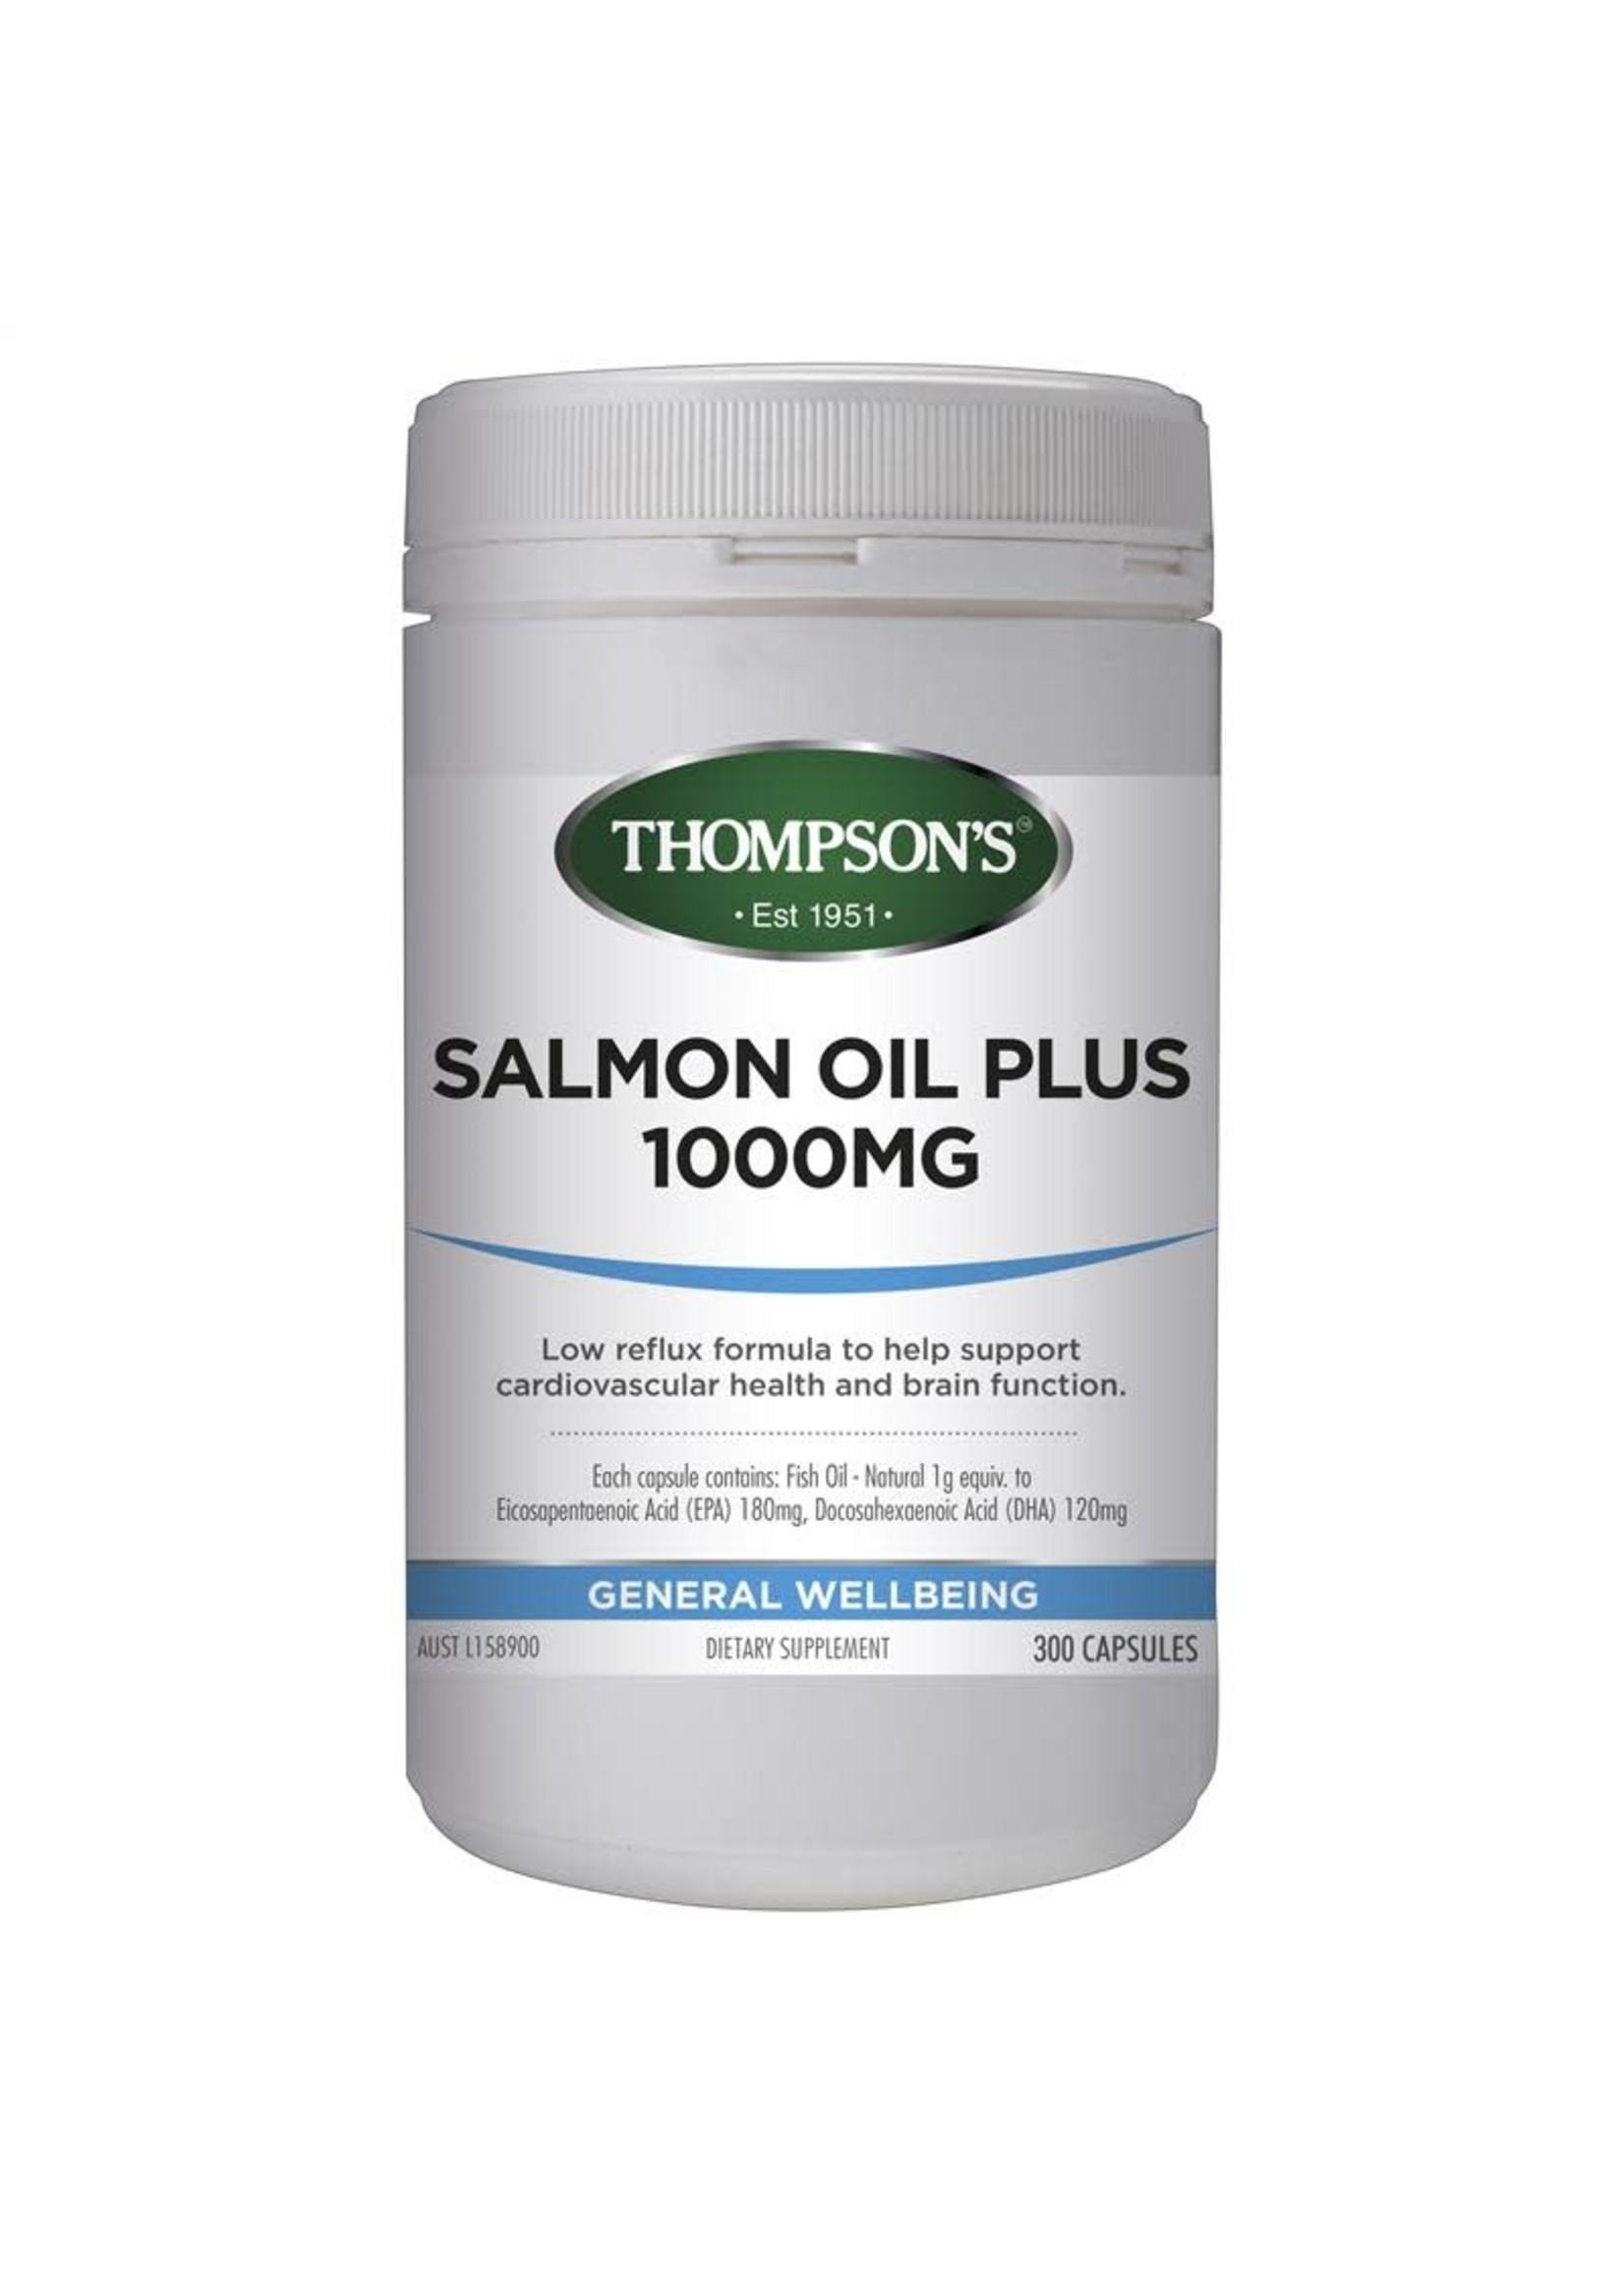 Thompson's Thompsons Salmon Oil Plus 1000mg 300 caps